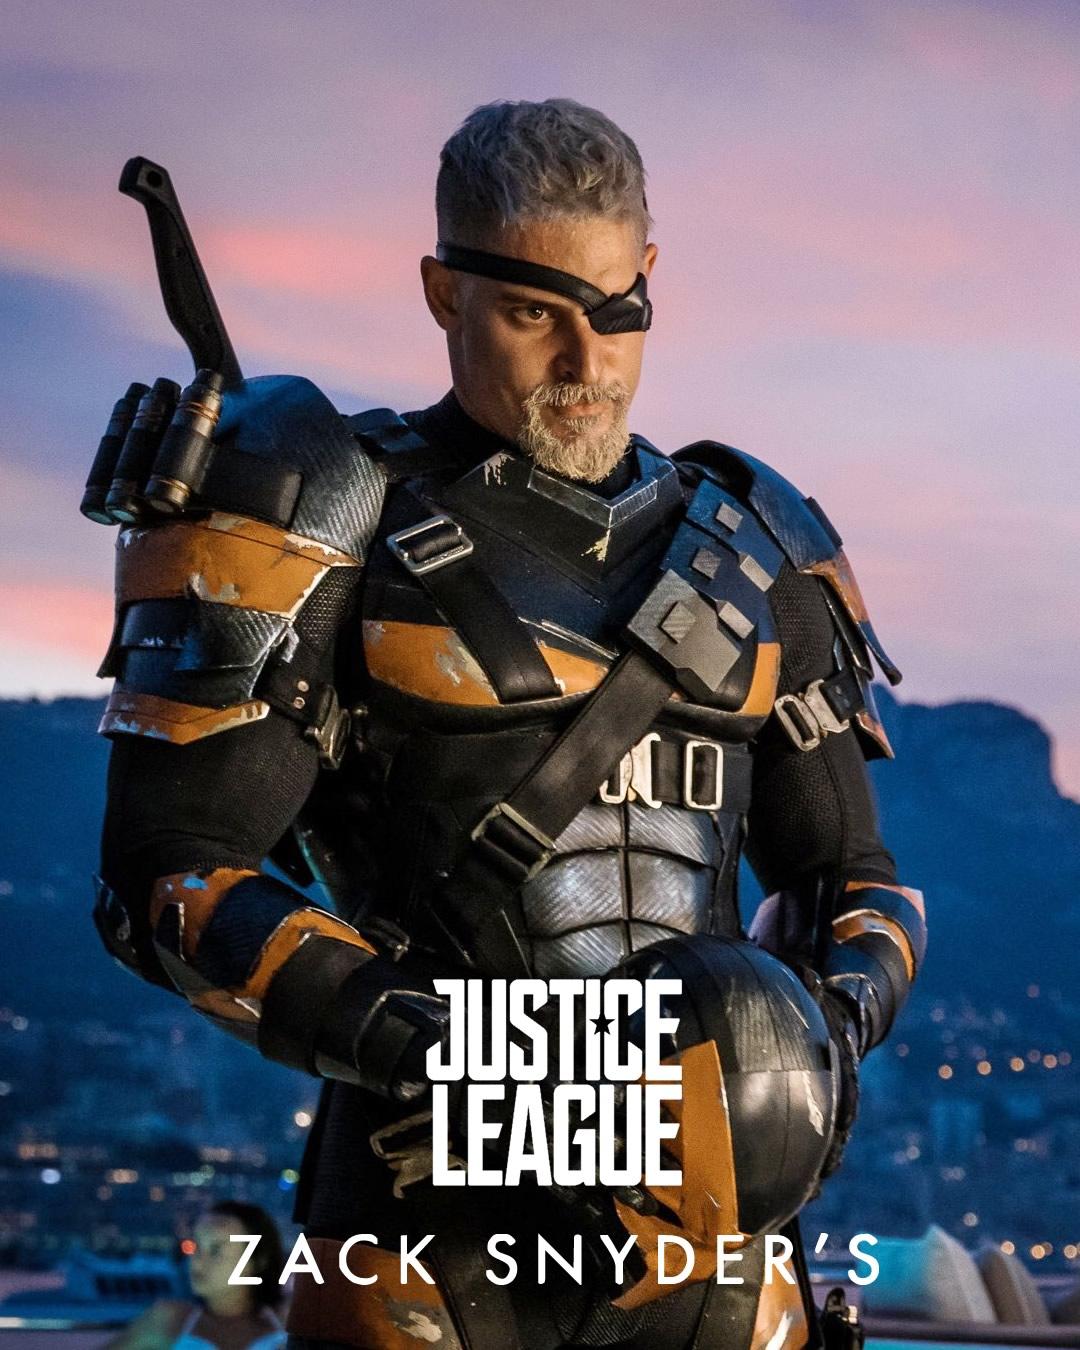 deathstroke jl joe manganiello poster - Exterminador de Joe Manganiello estará em Liga da Justiça: Snyder Cut